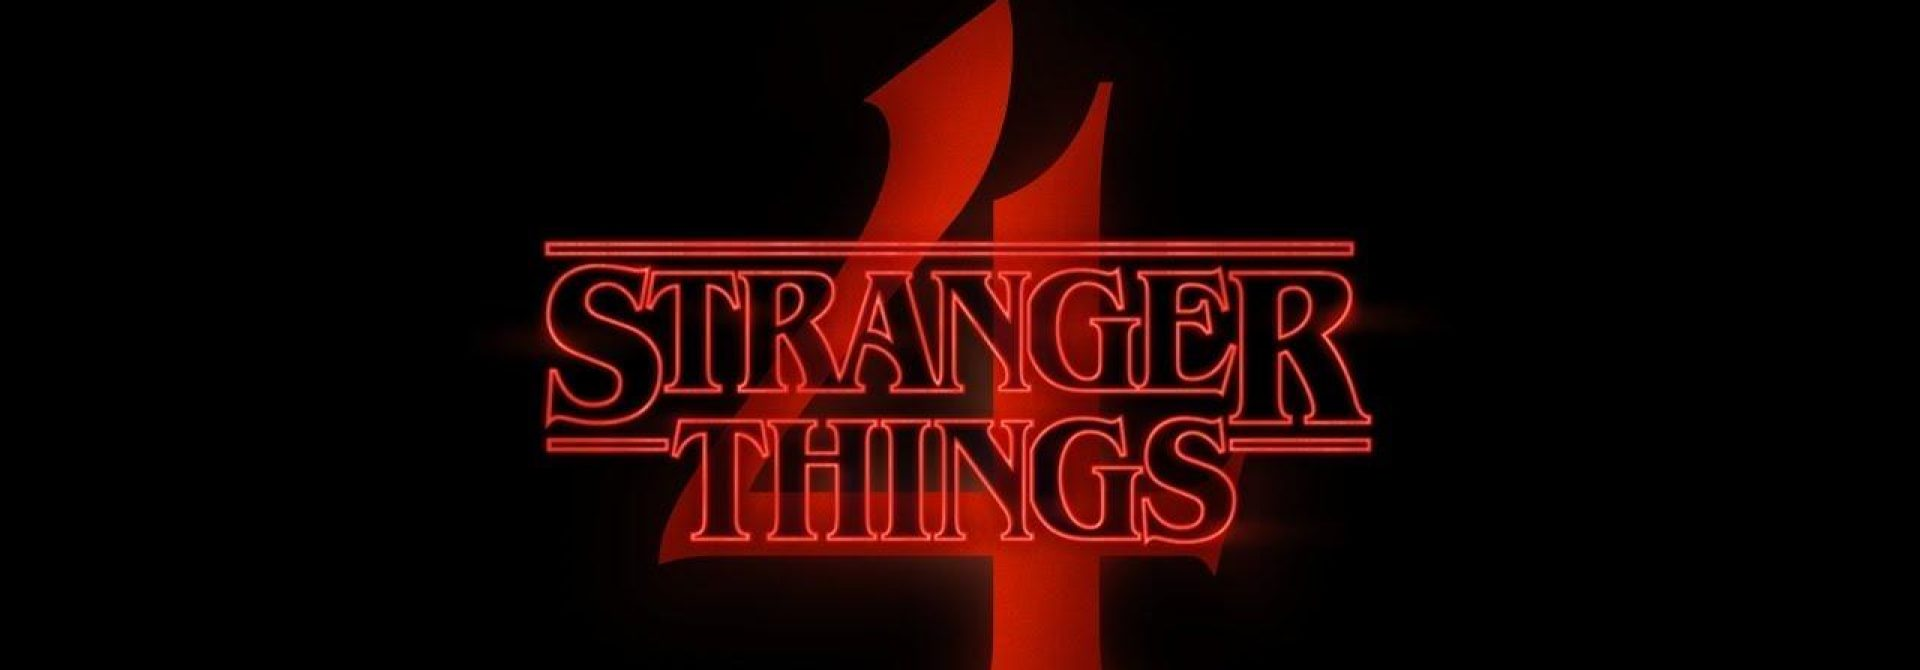 Robert Englund Joins Cast Of Stranger Things Season 4